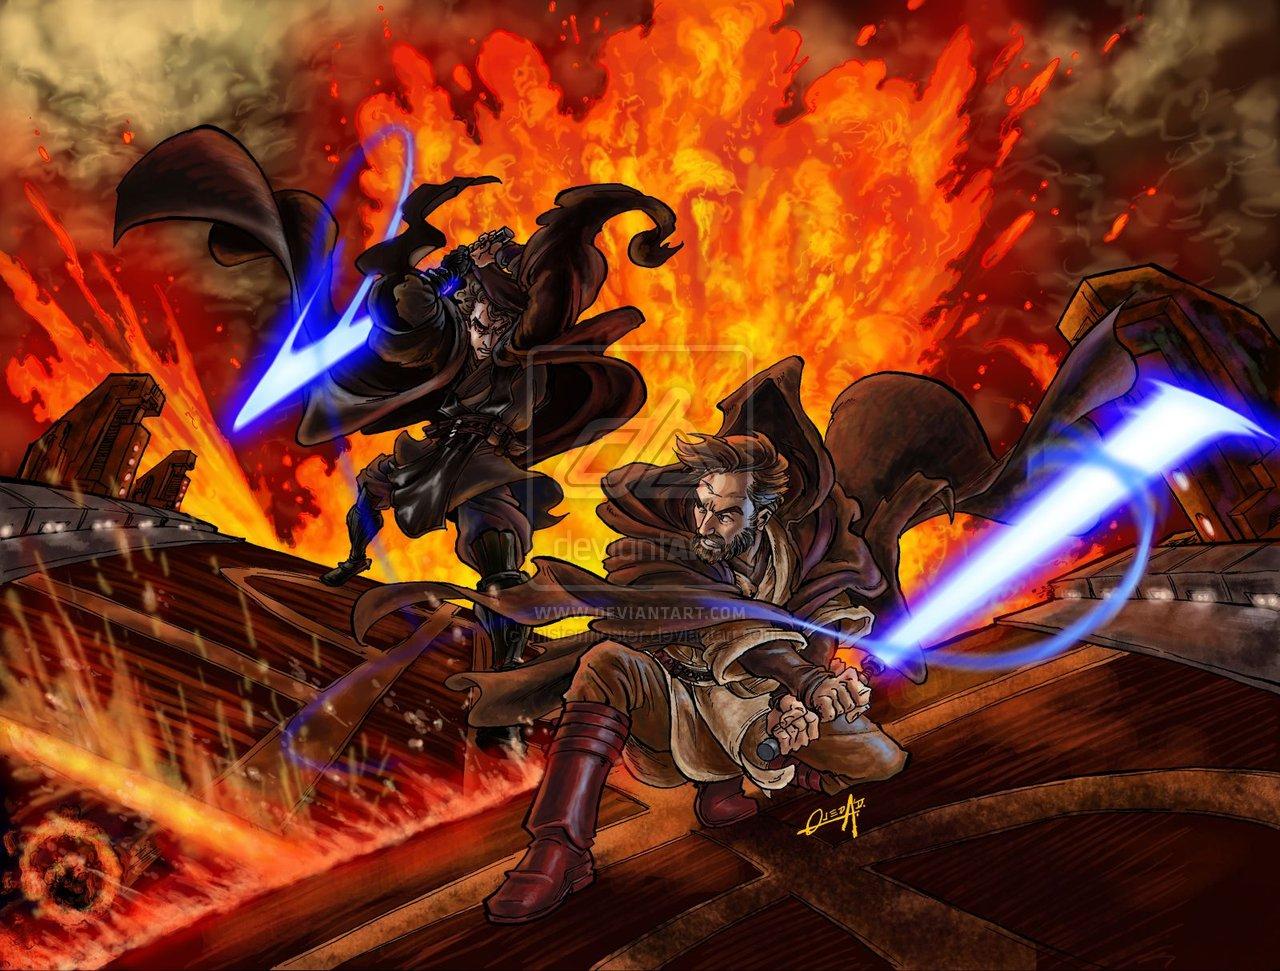 Obi wan vs Anakin by mistermoster 1280x971